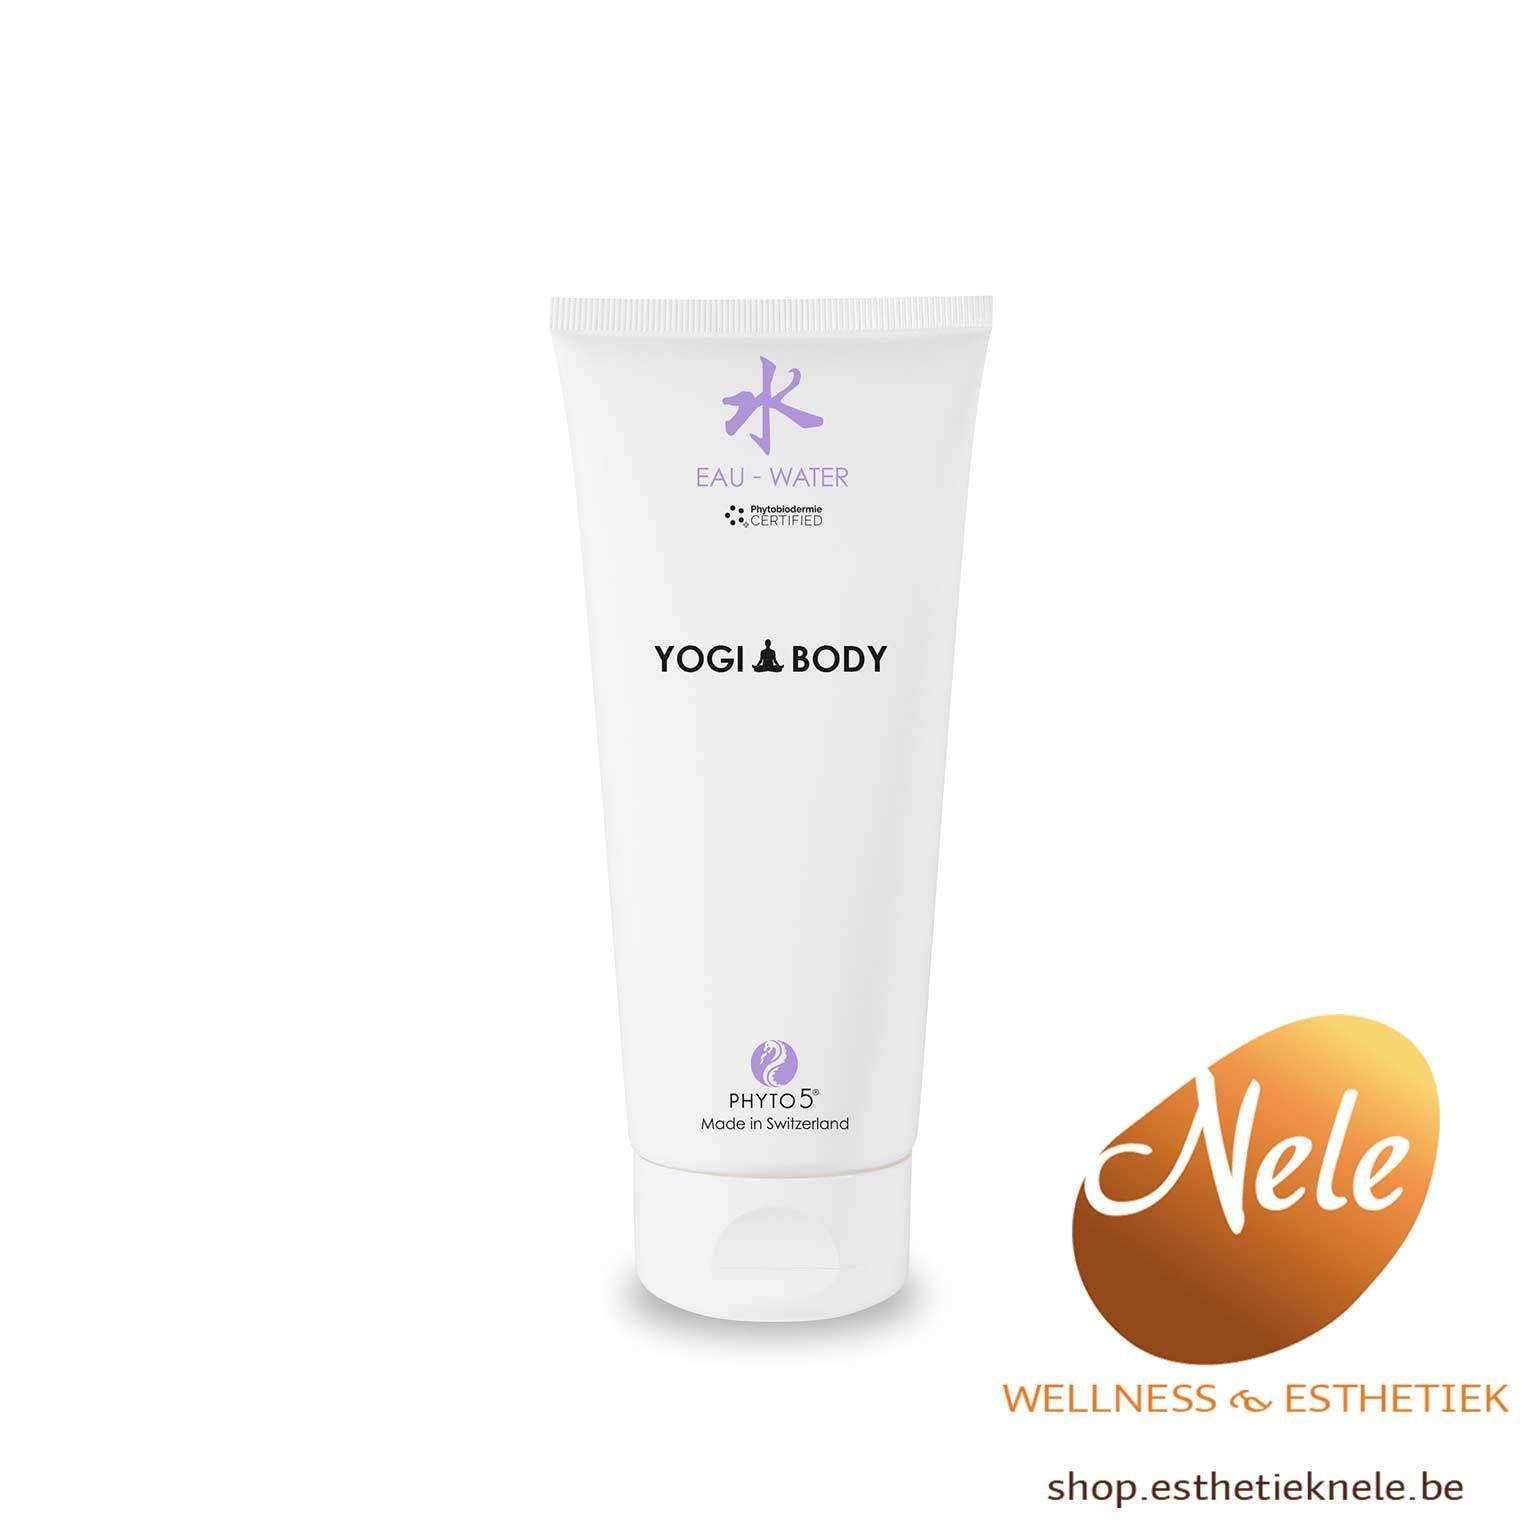 PHYTO 5 Yogi Body Gel shop Water paars Esthetiek Nele